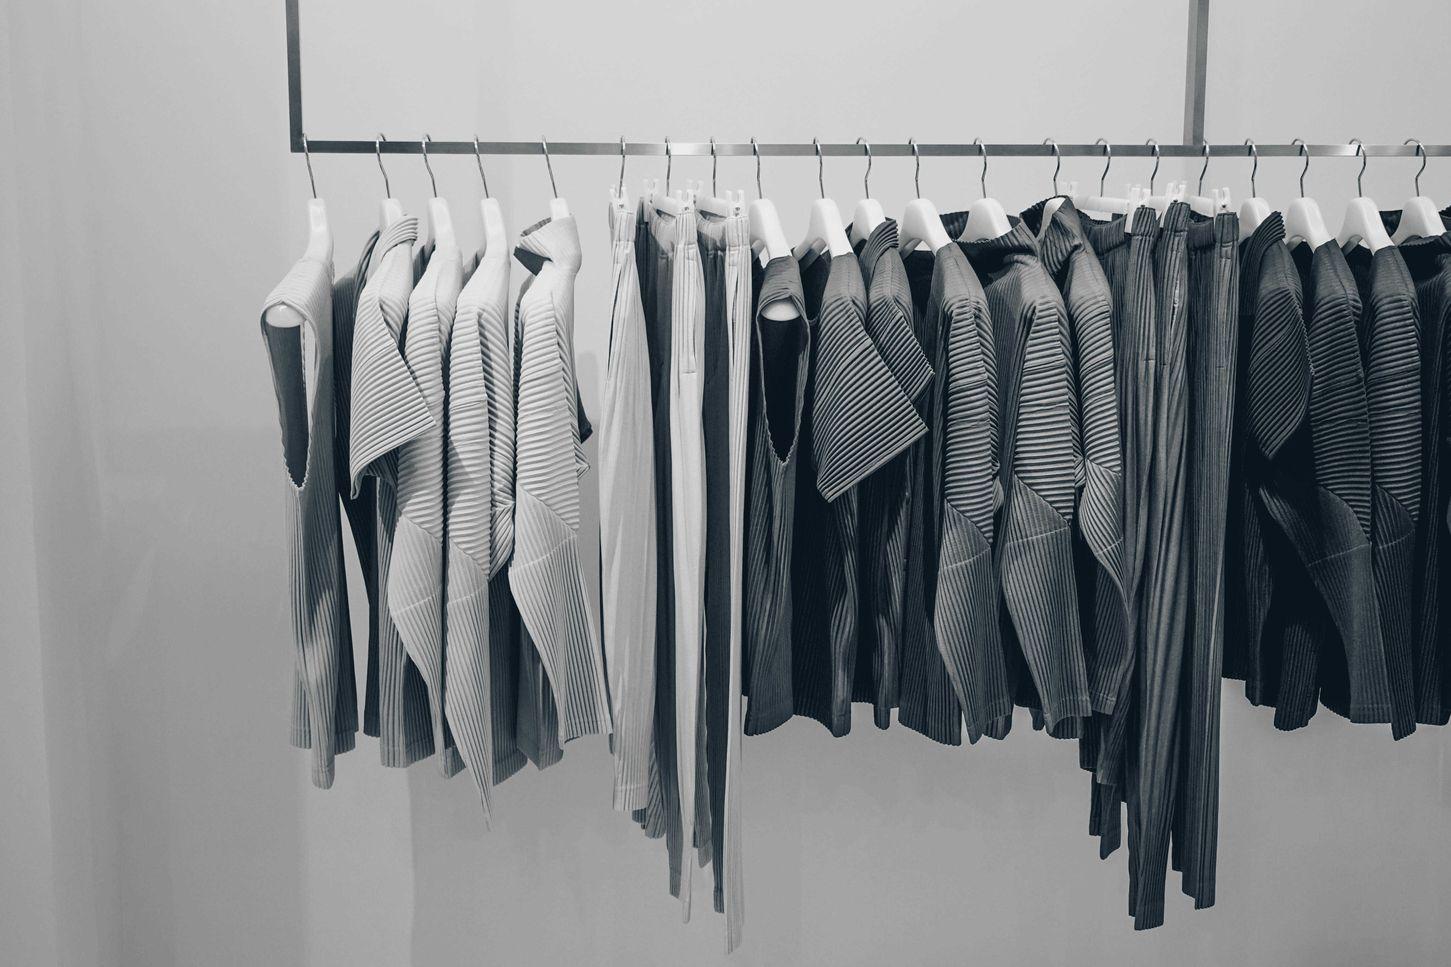 Grijze kleding